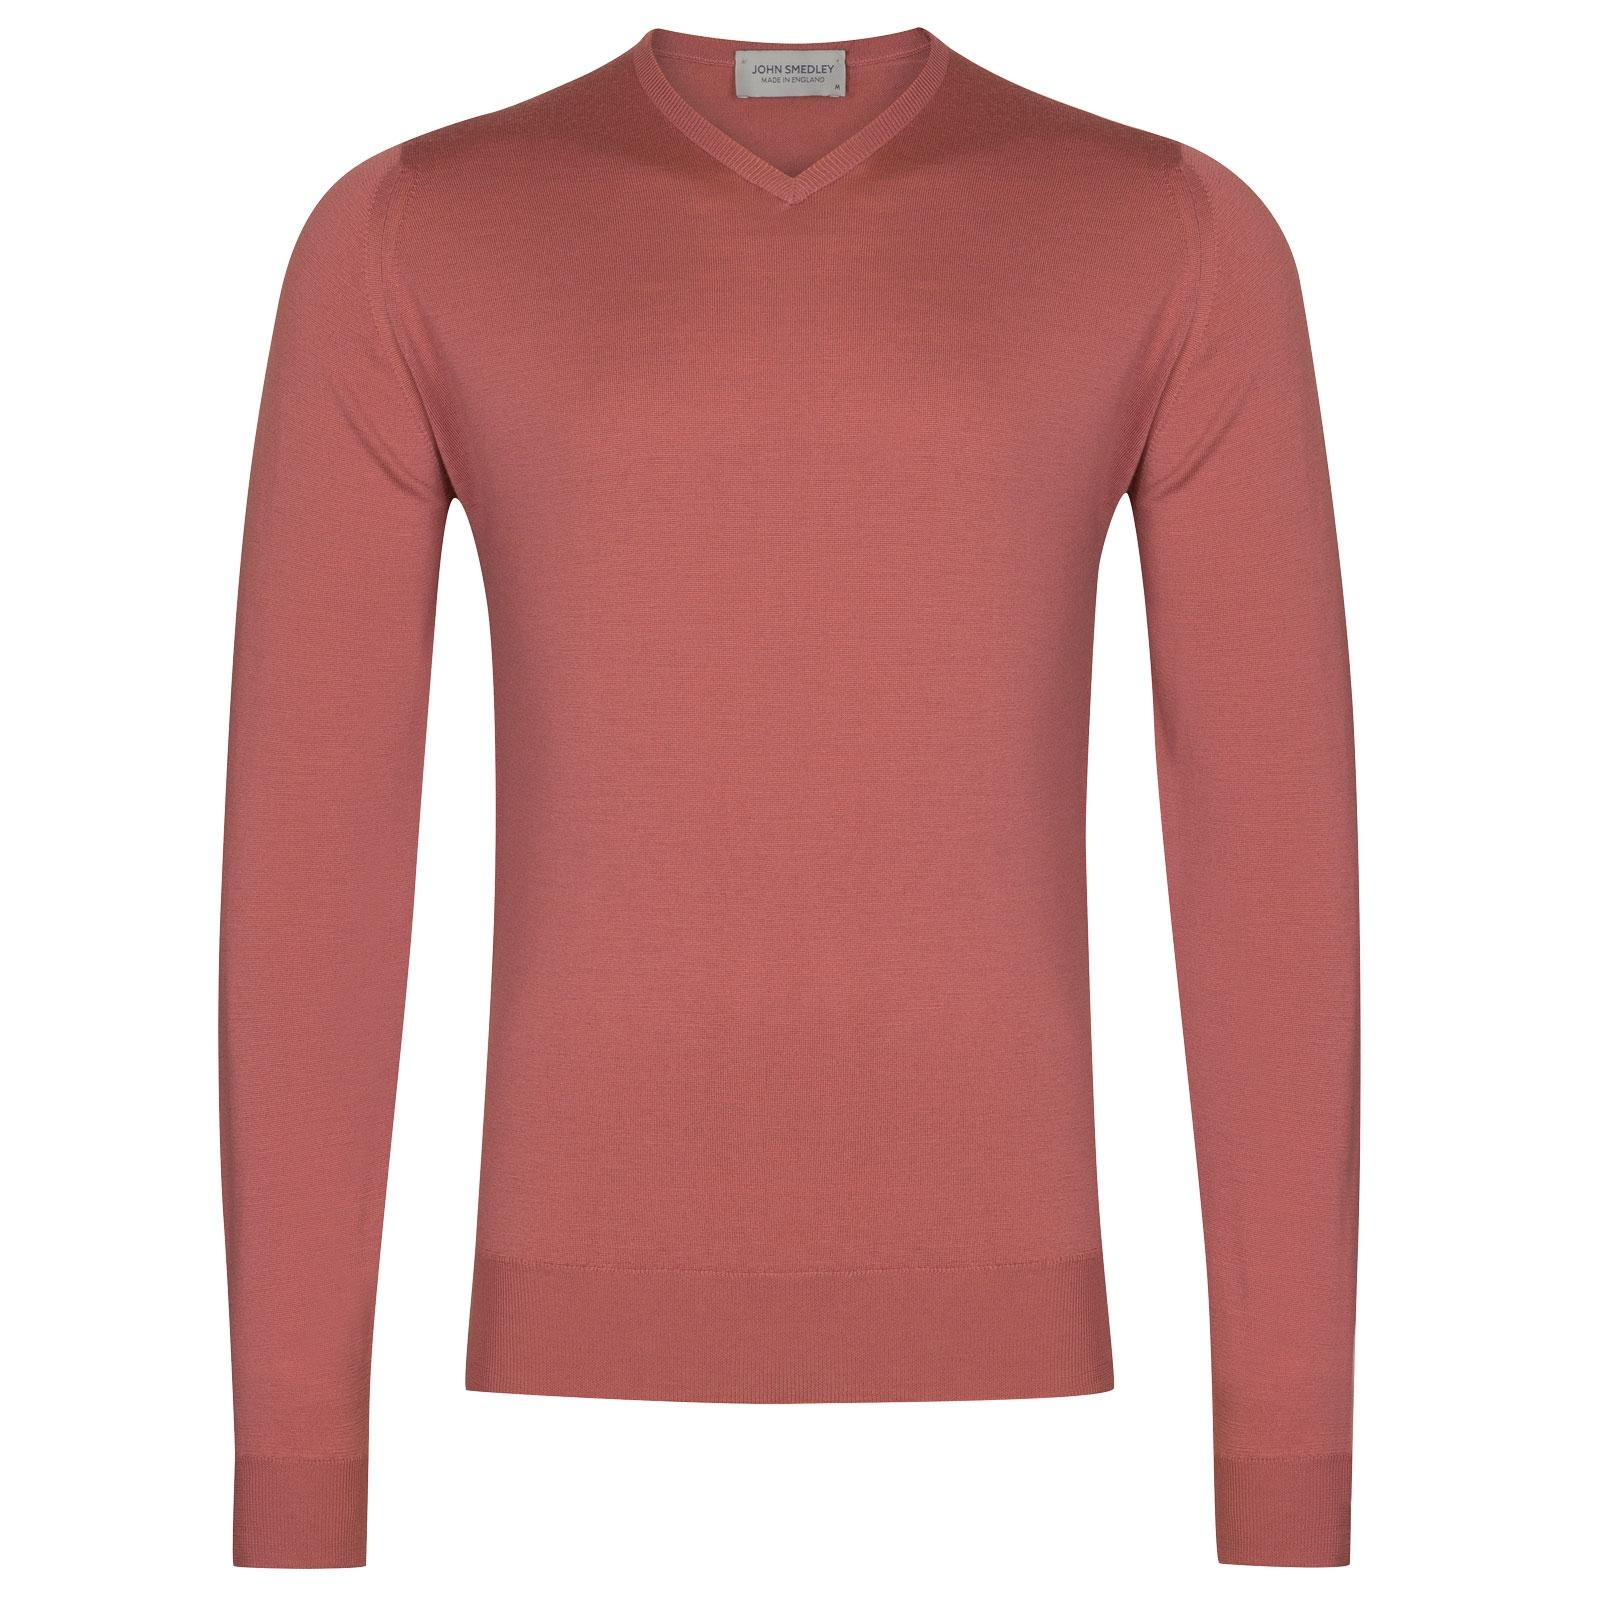 John Smedley Shipton in Azalea Pink Pullover-XLG